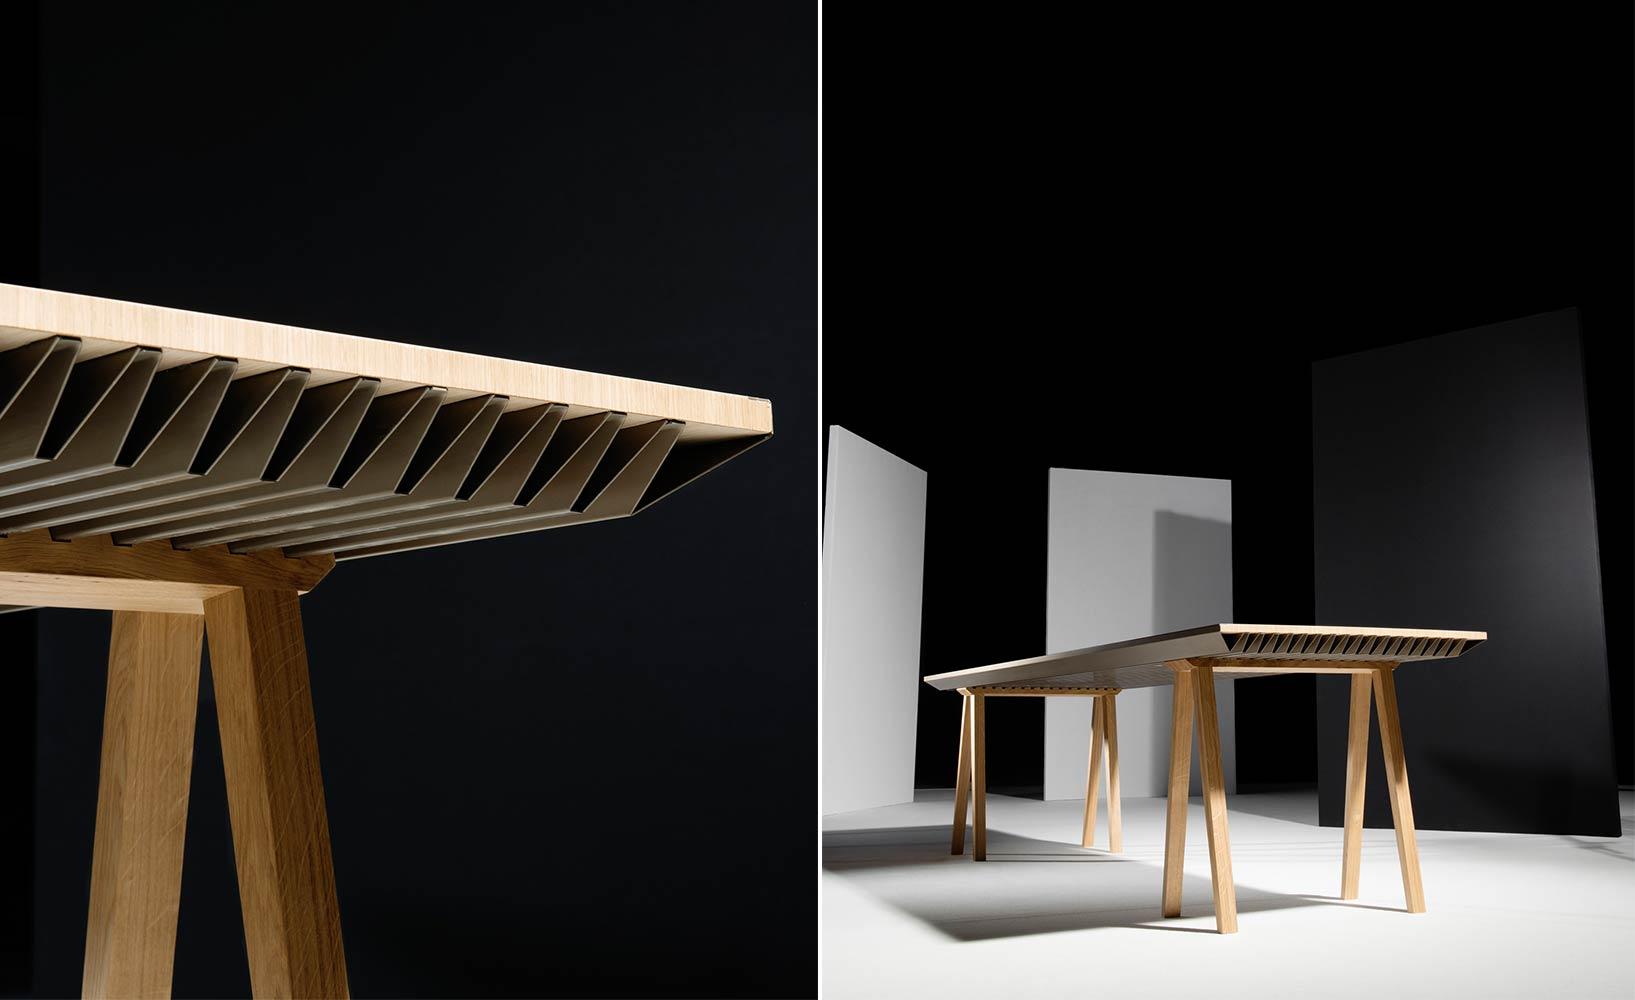 5 smarte Tische